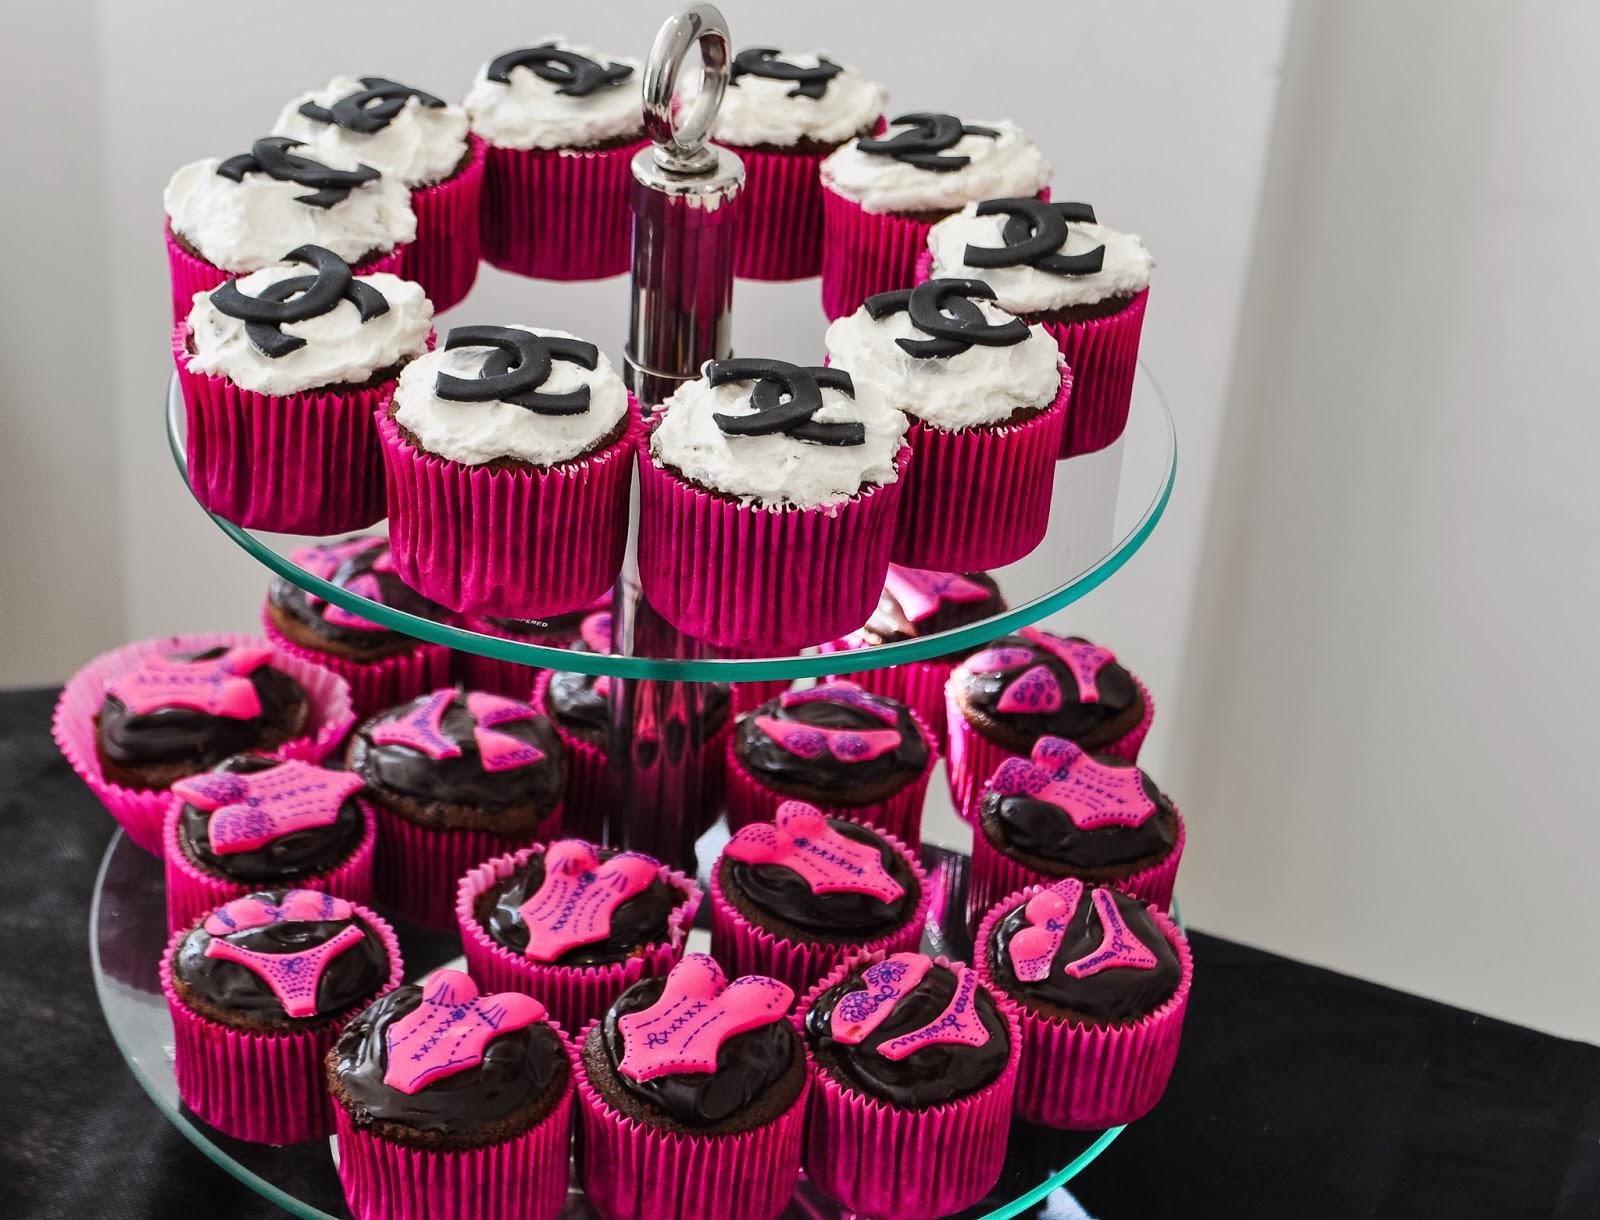 cha-lingerie-decoracao-cupcakes